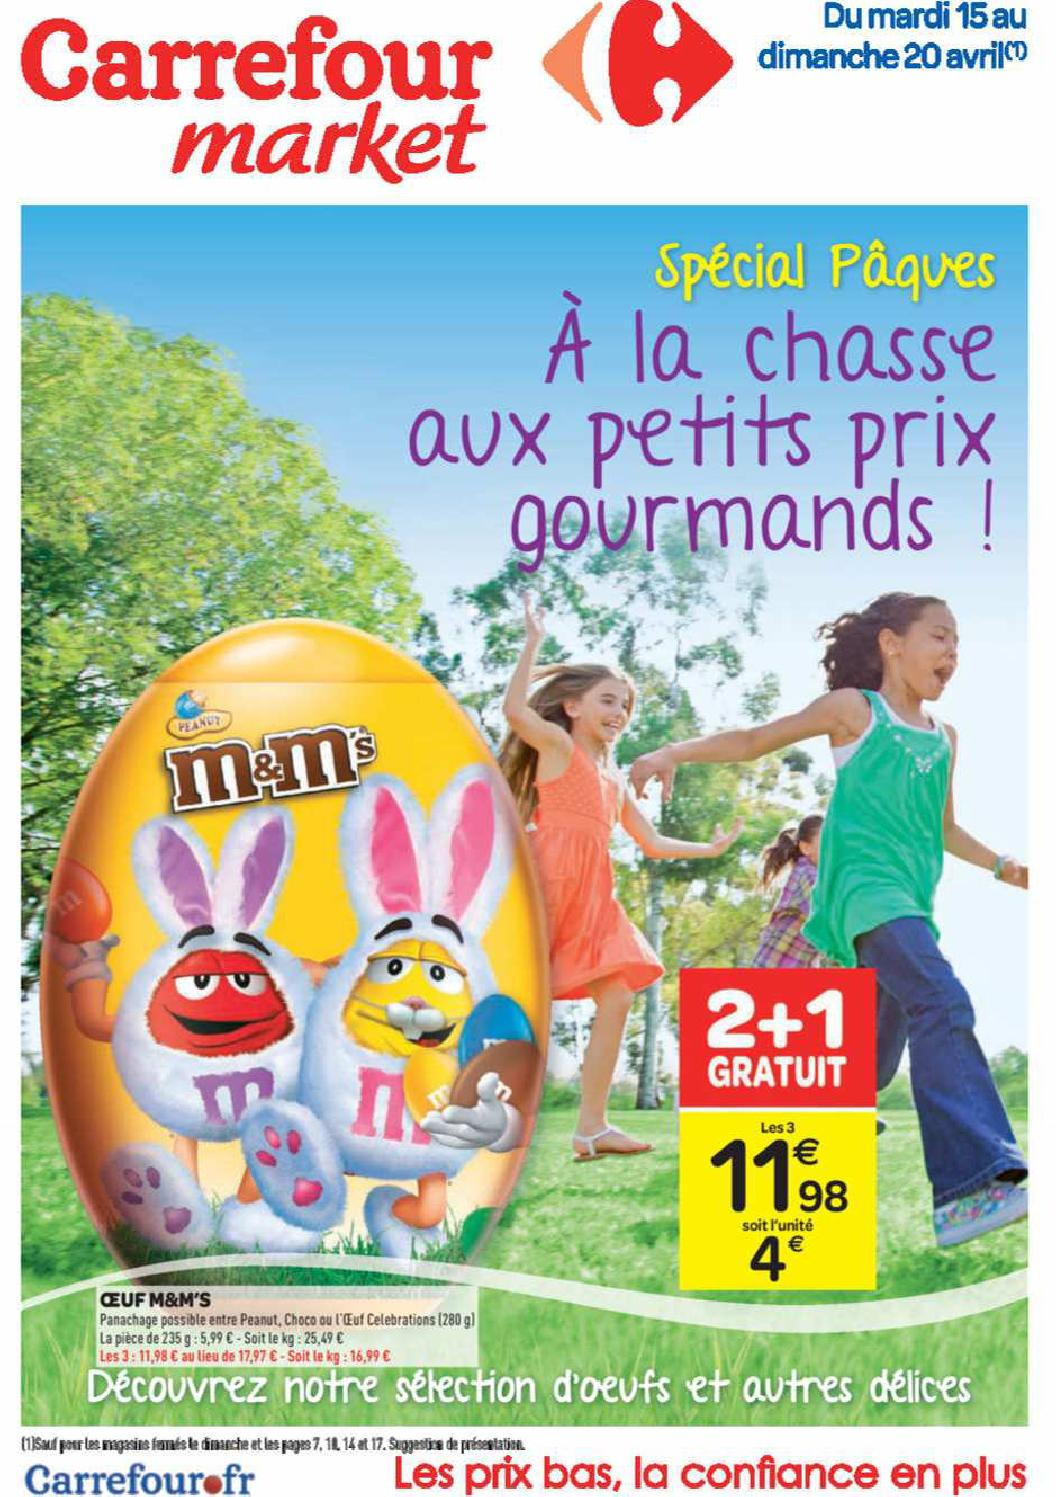 Catalogue Carrefour Market Anti Crise : catalogue, carrefour, market, crise, Catalogue, Carrefour, Market, Avril, Anti-Crise.fr, Issuu